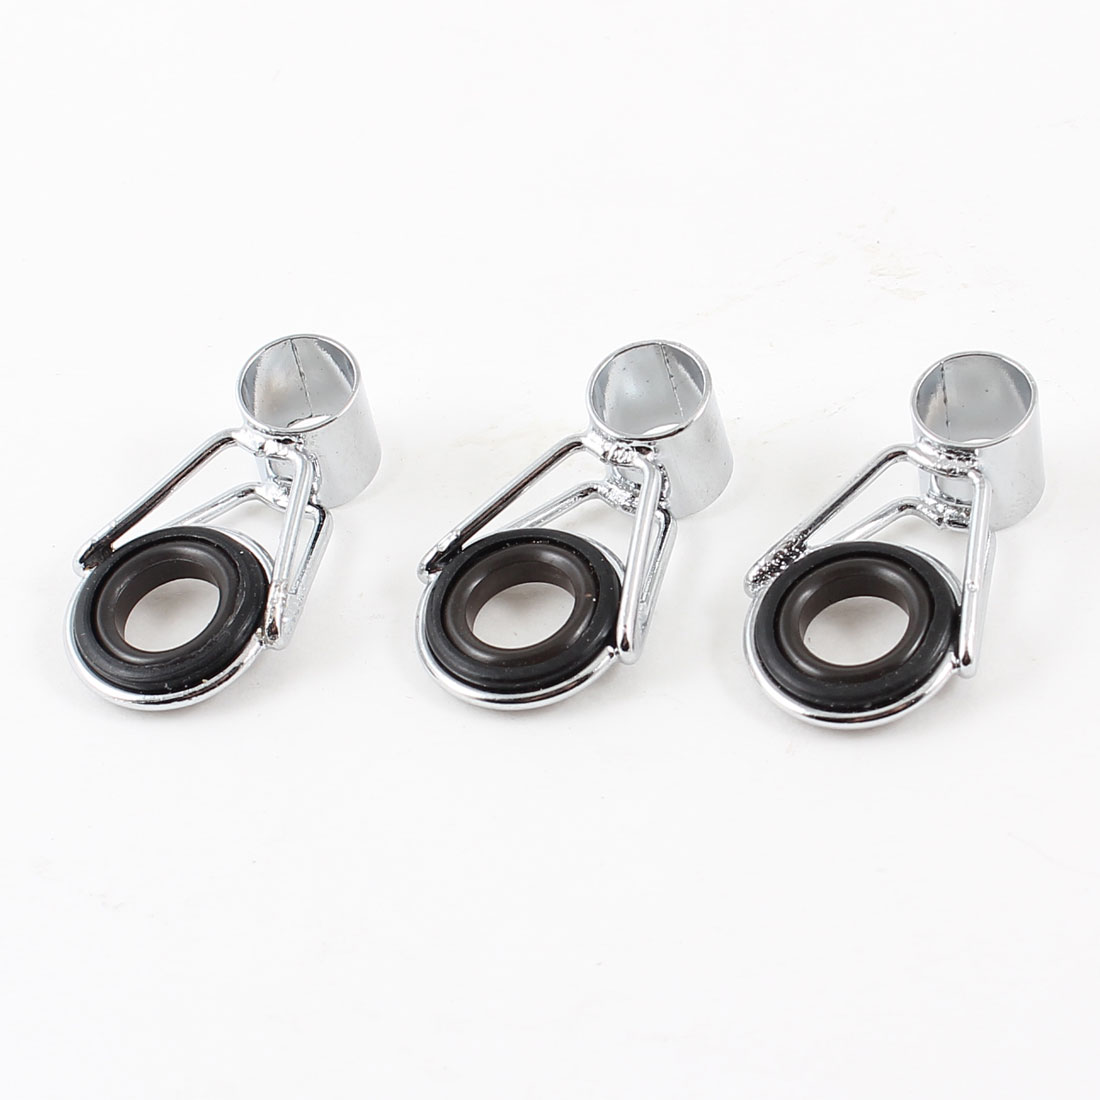 "3Pcs 0.28"" Dia Fishing Rod Guide Tip Ring Eye Repair Spare Kit"